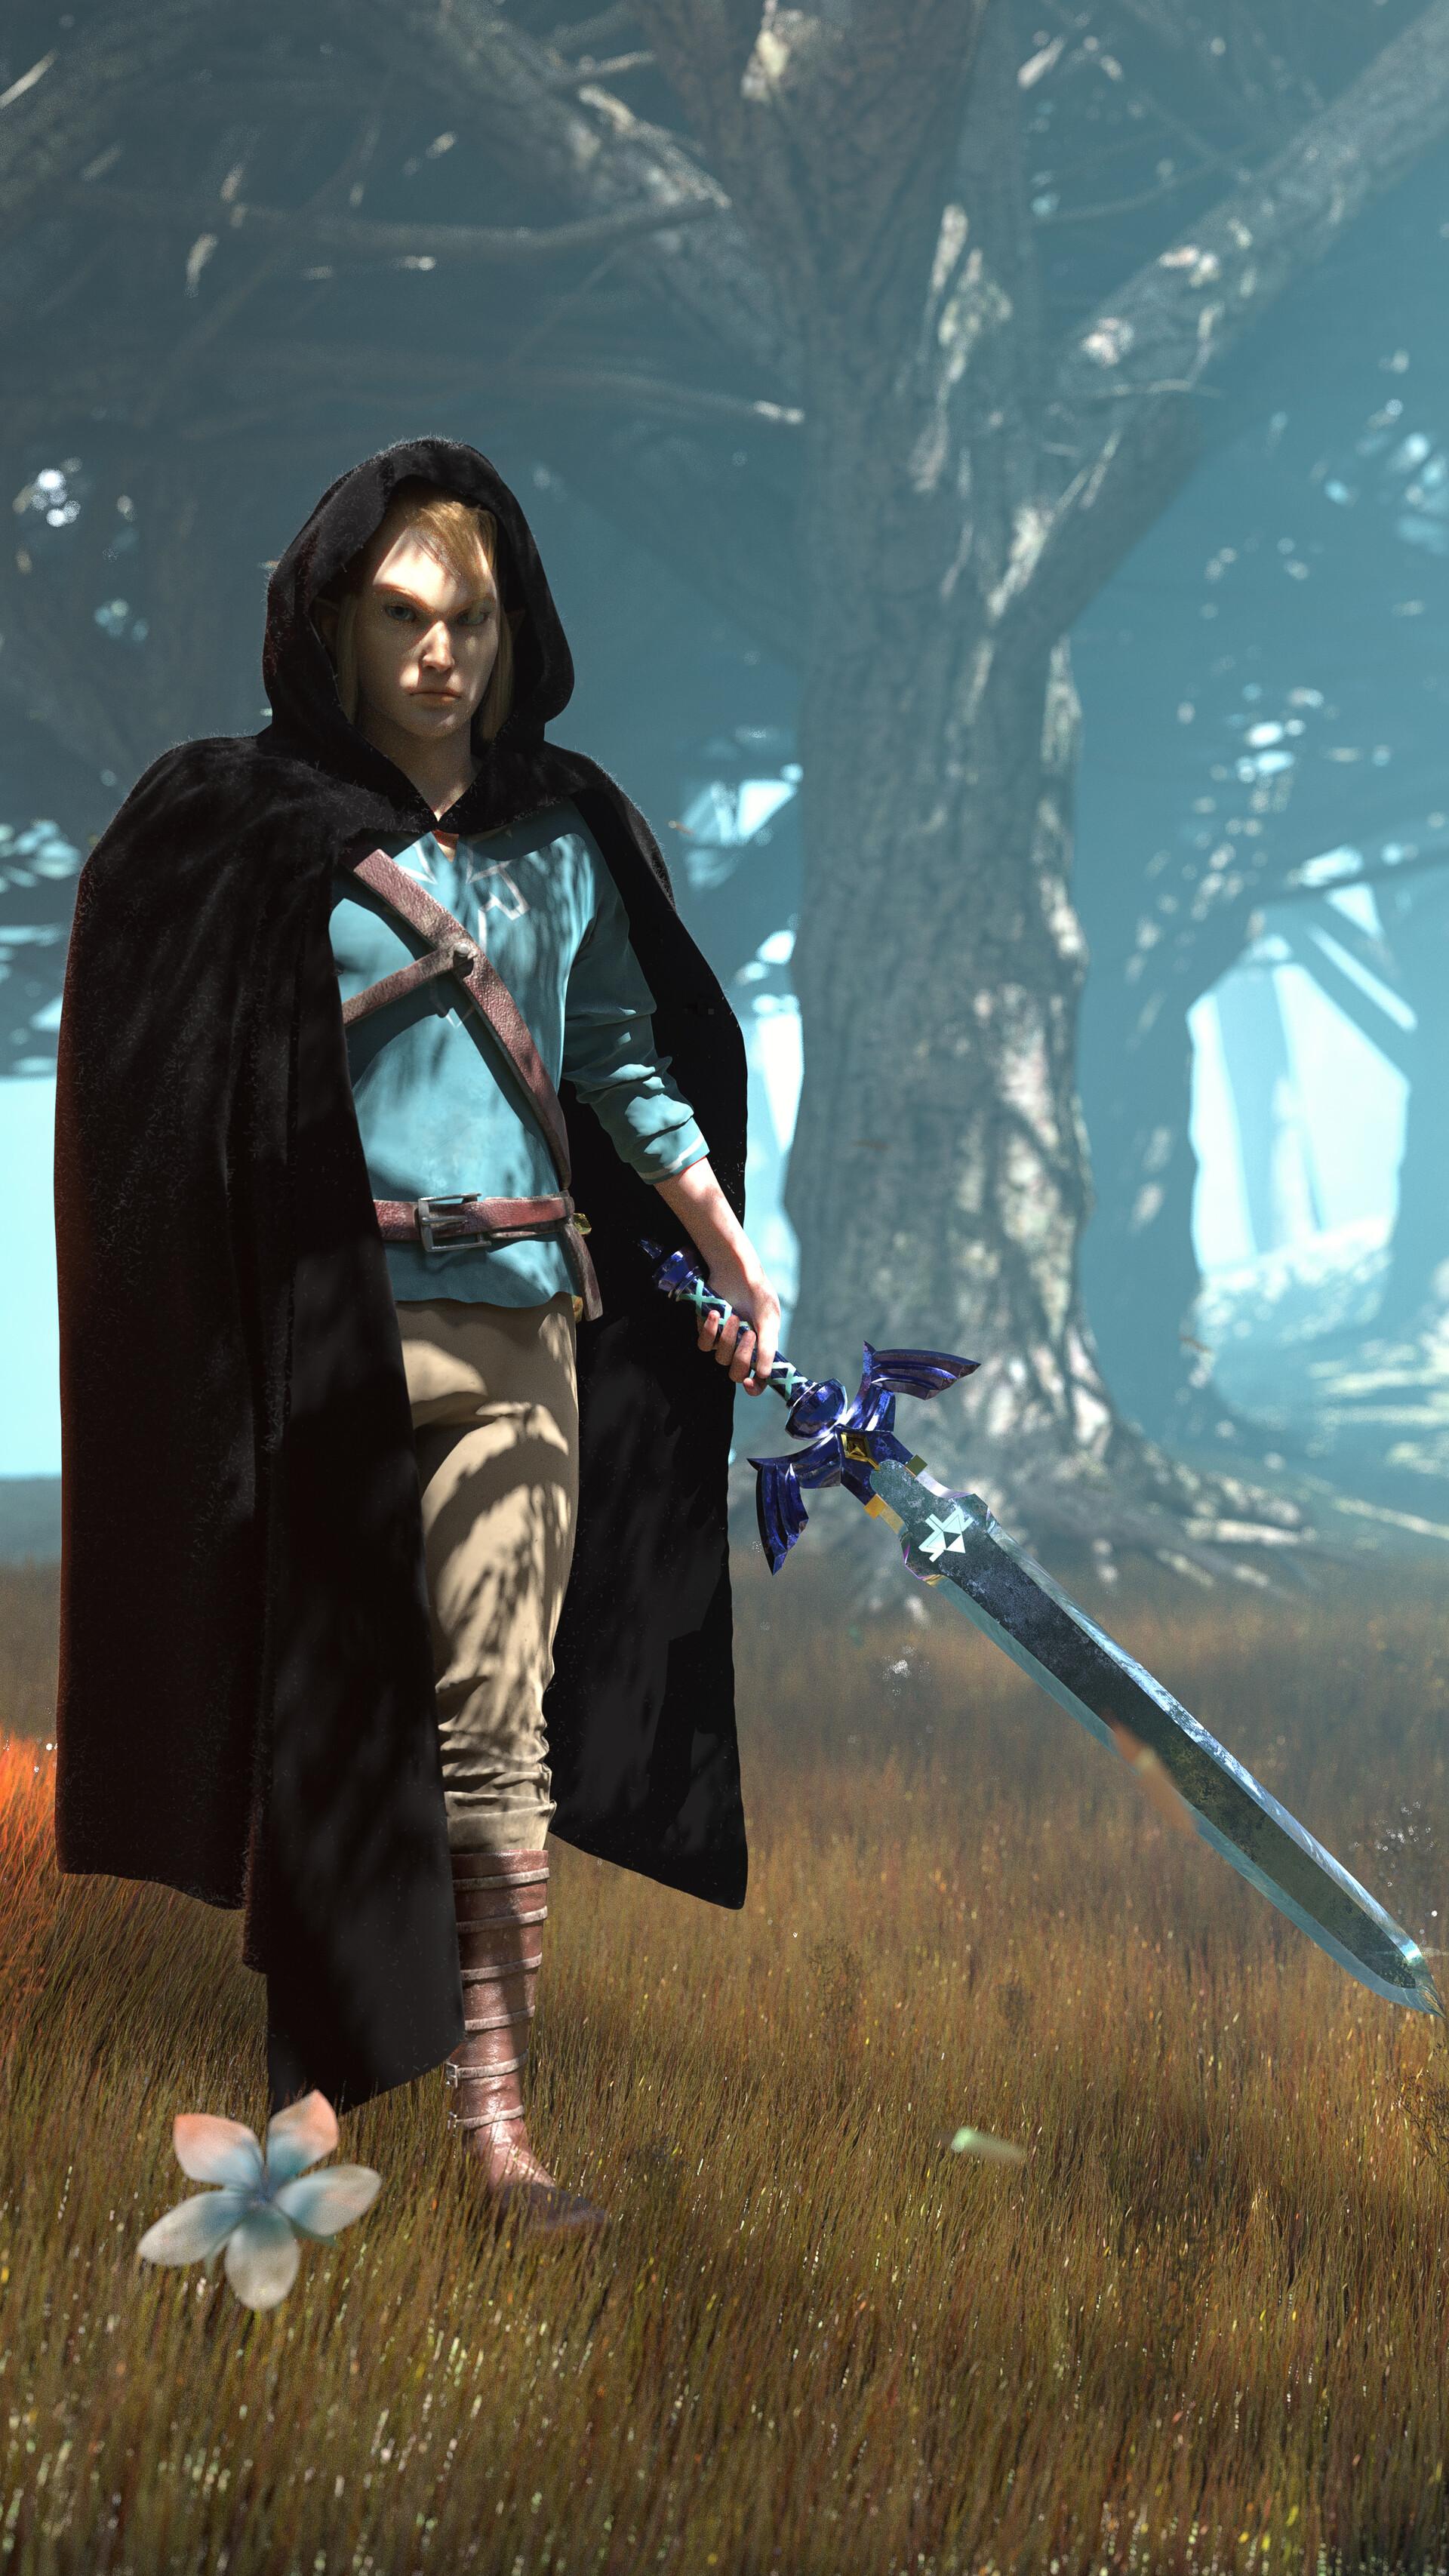 Youssef Hesham Link The Legend Of Zelda Breath Of The